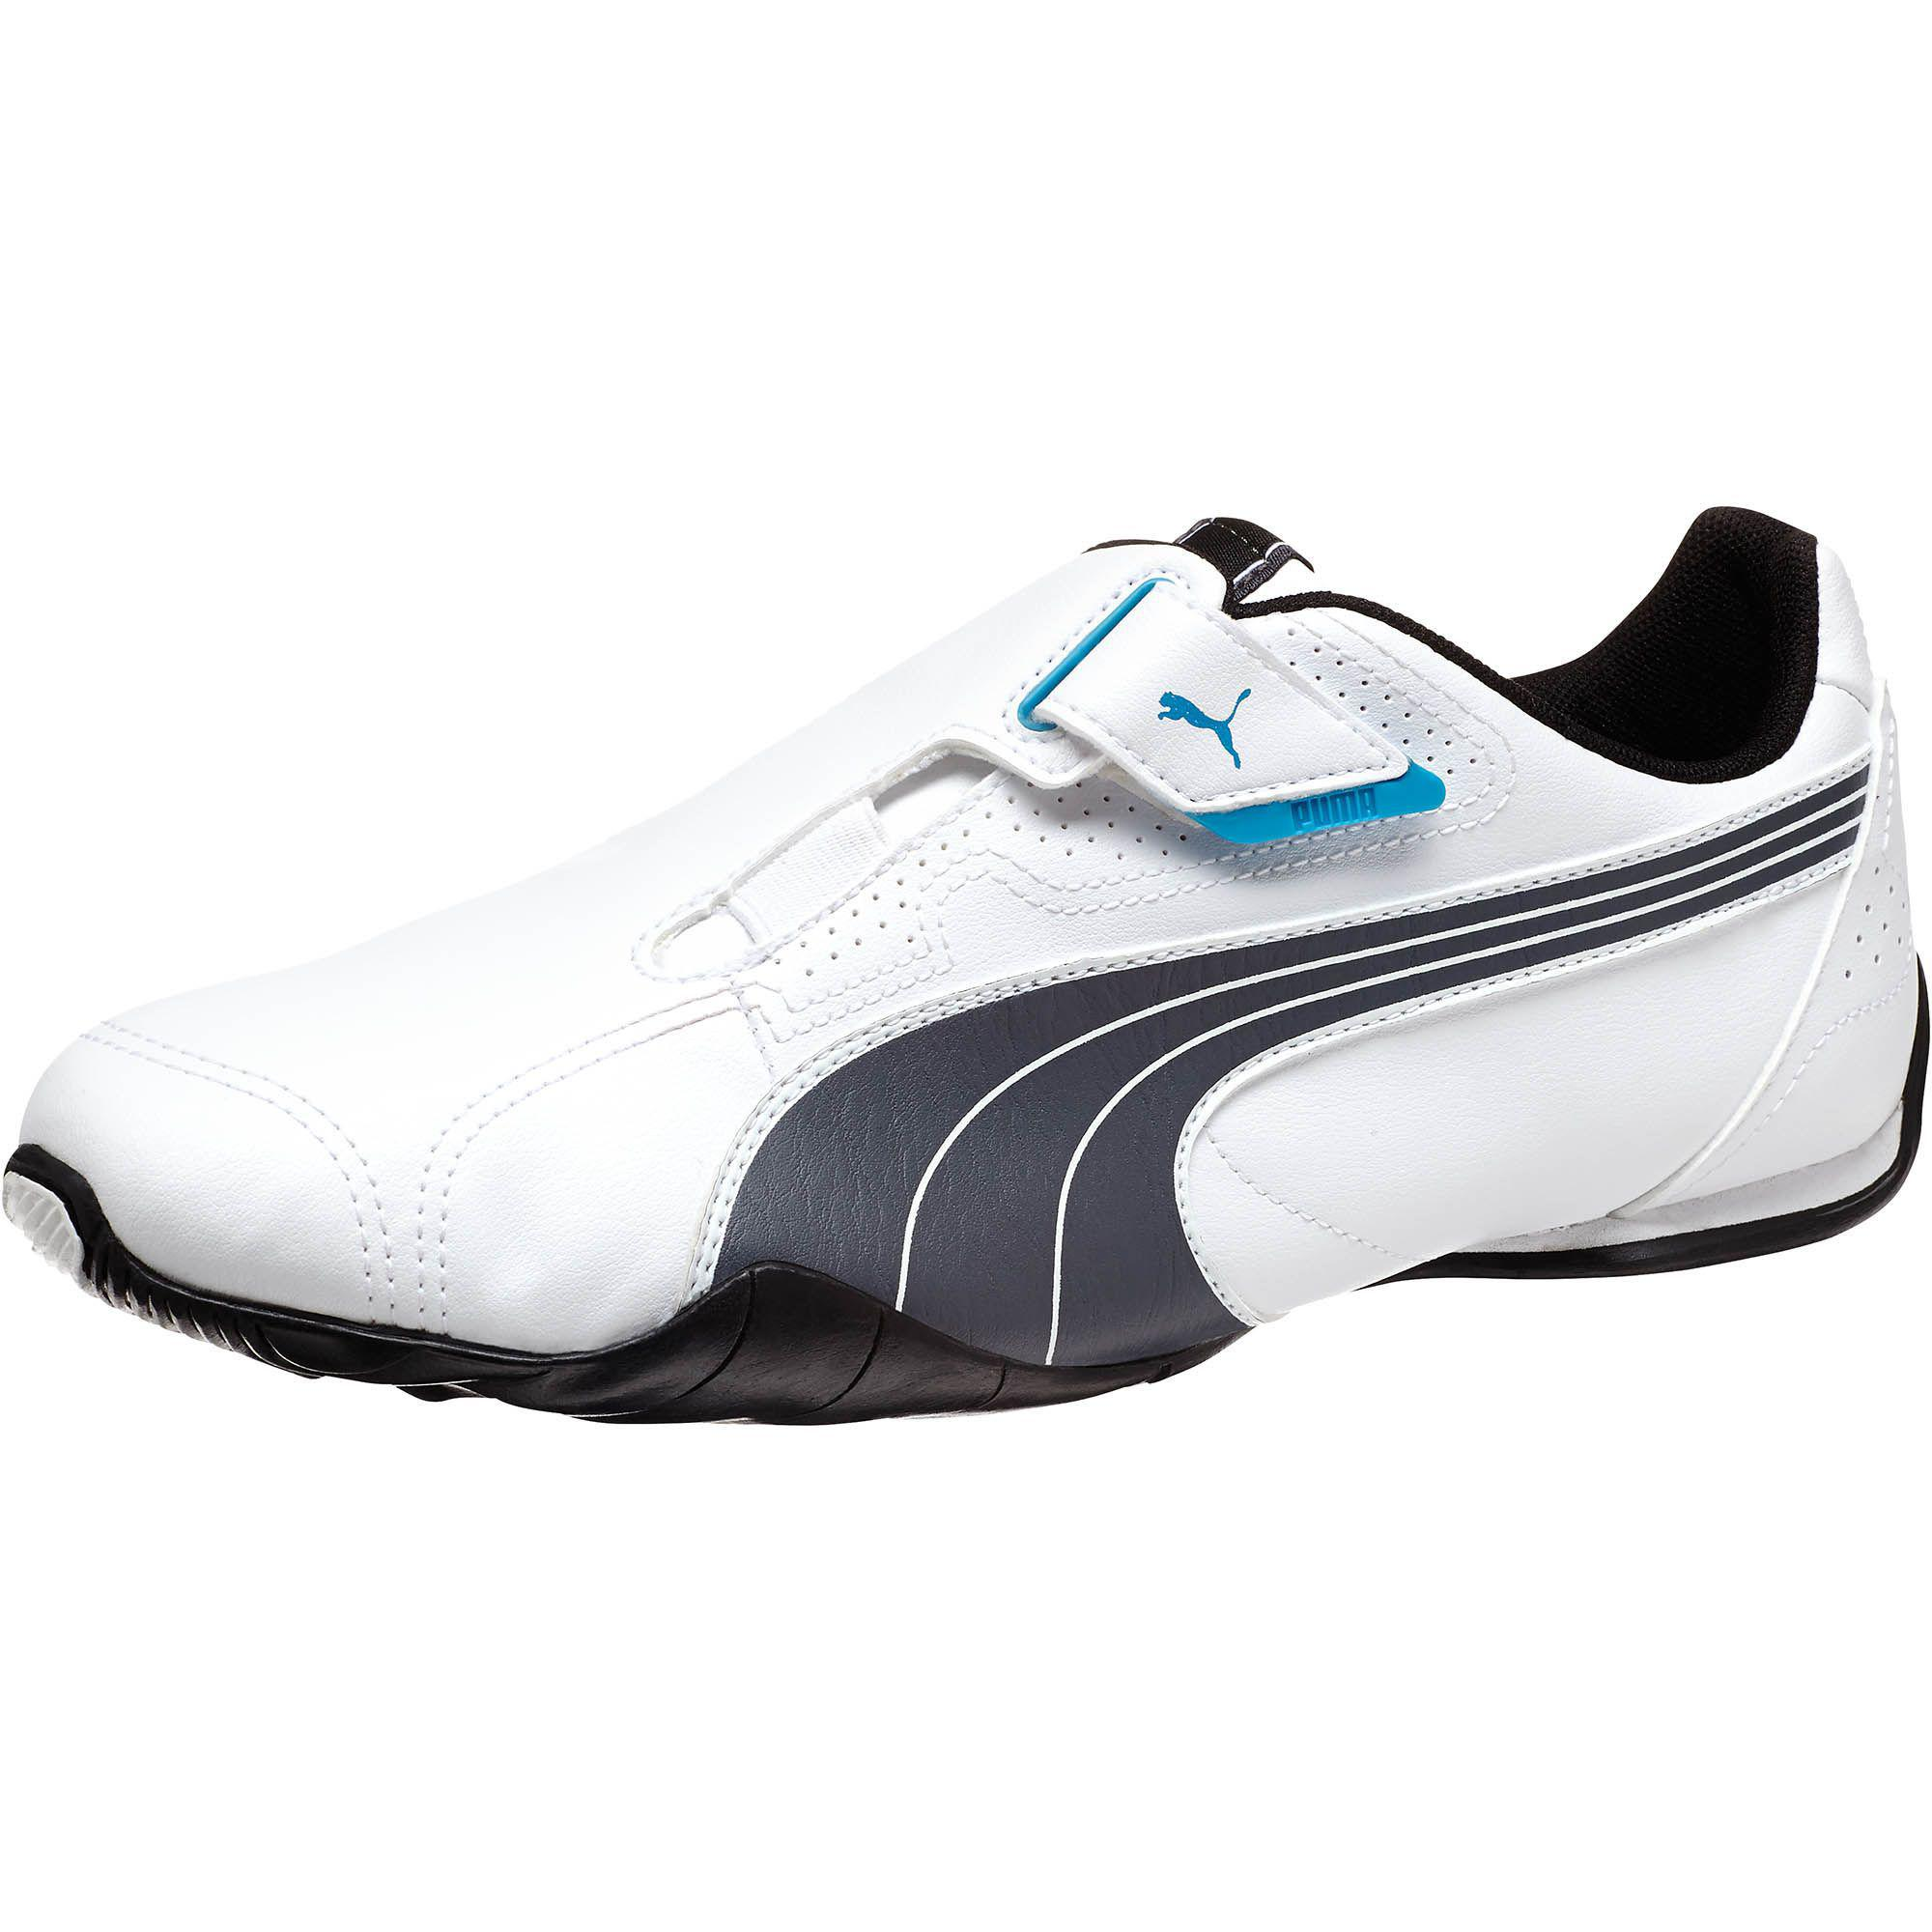 fa459275c4ae Lyst - PUMA Redon Move Men s Shoes in White for Men